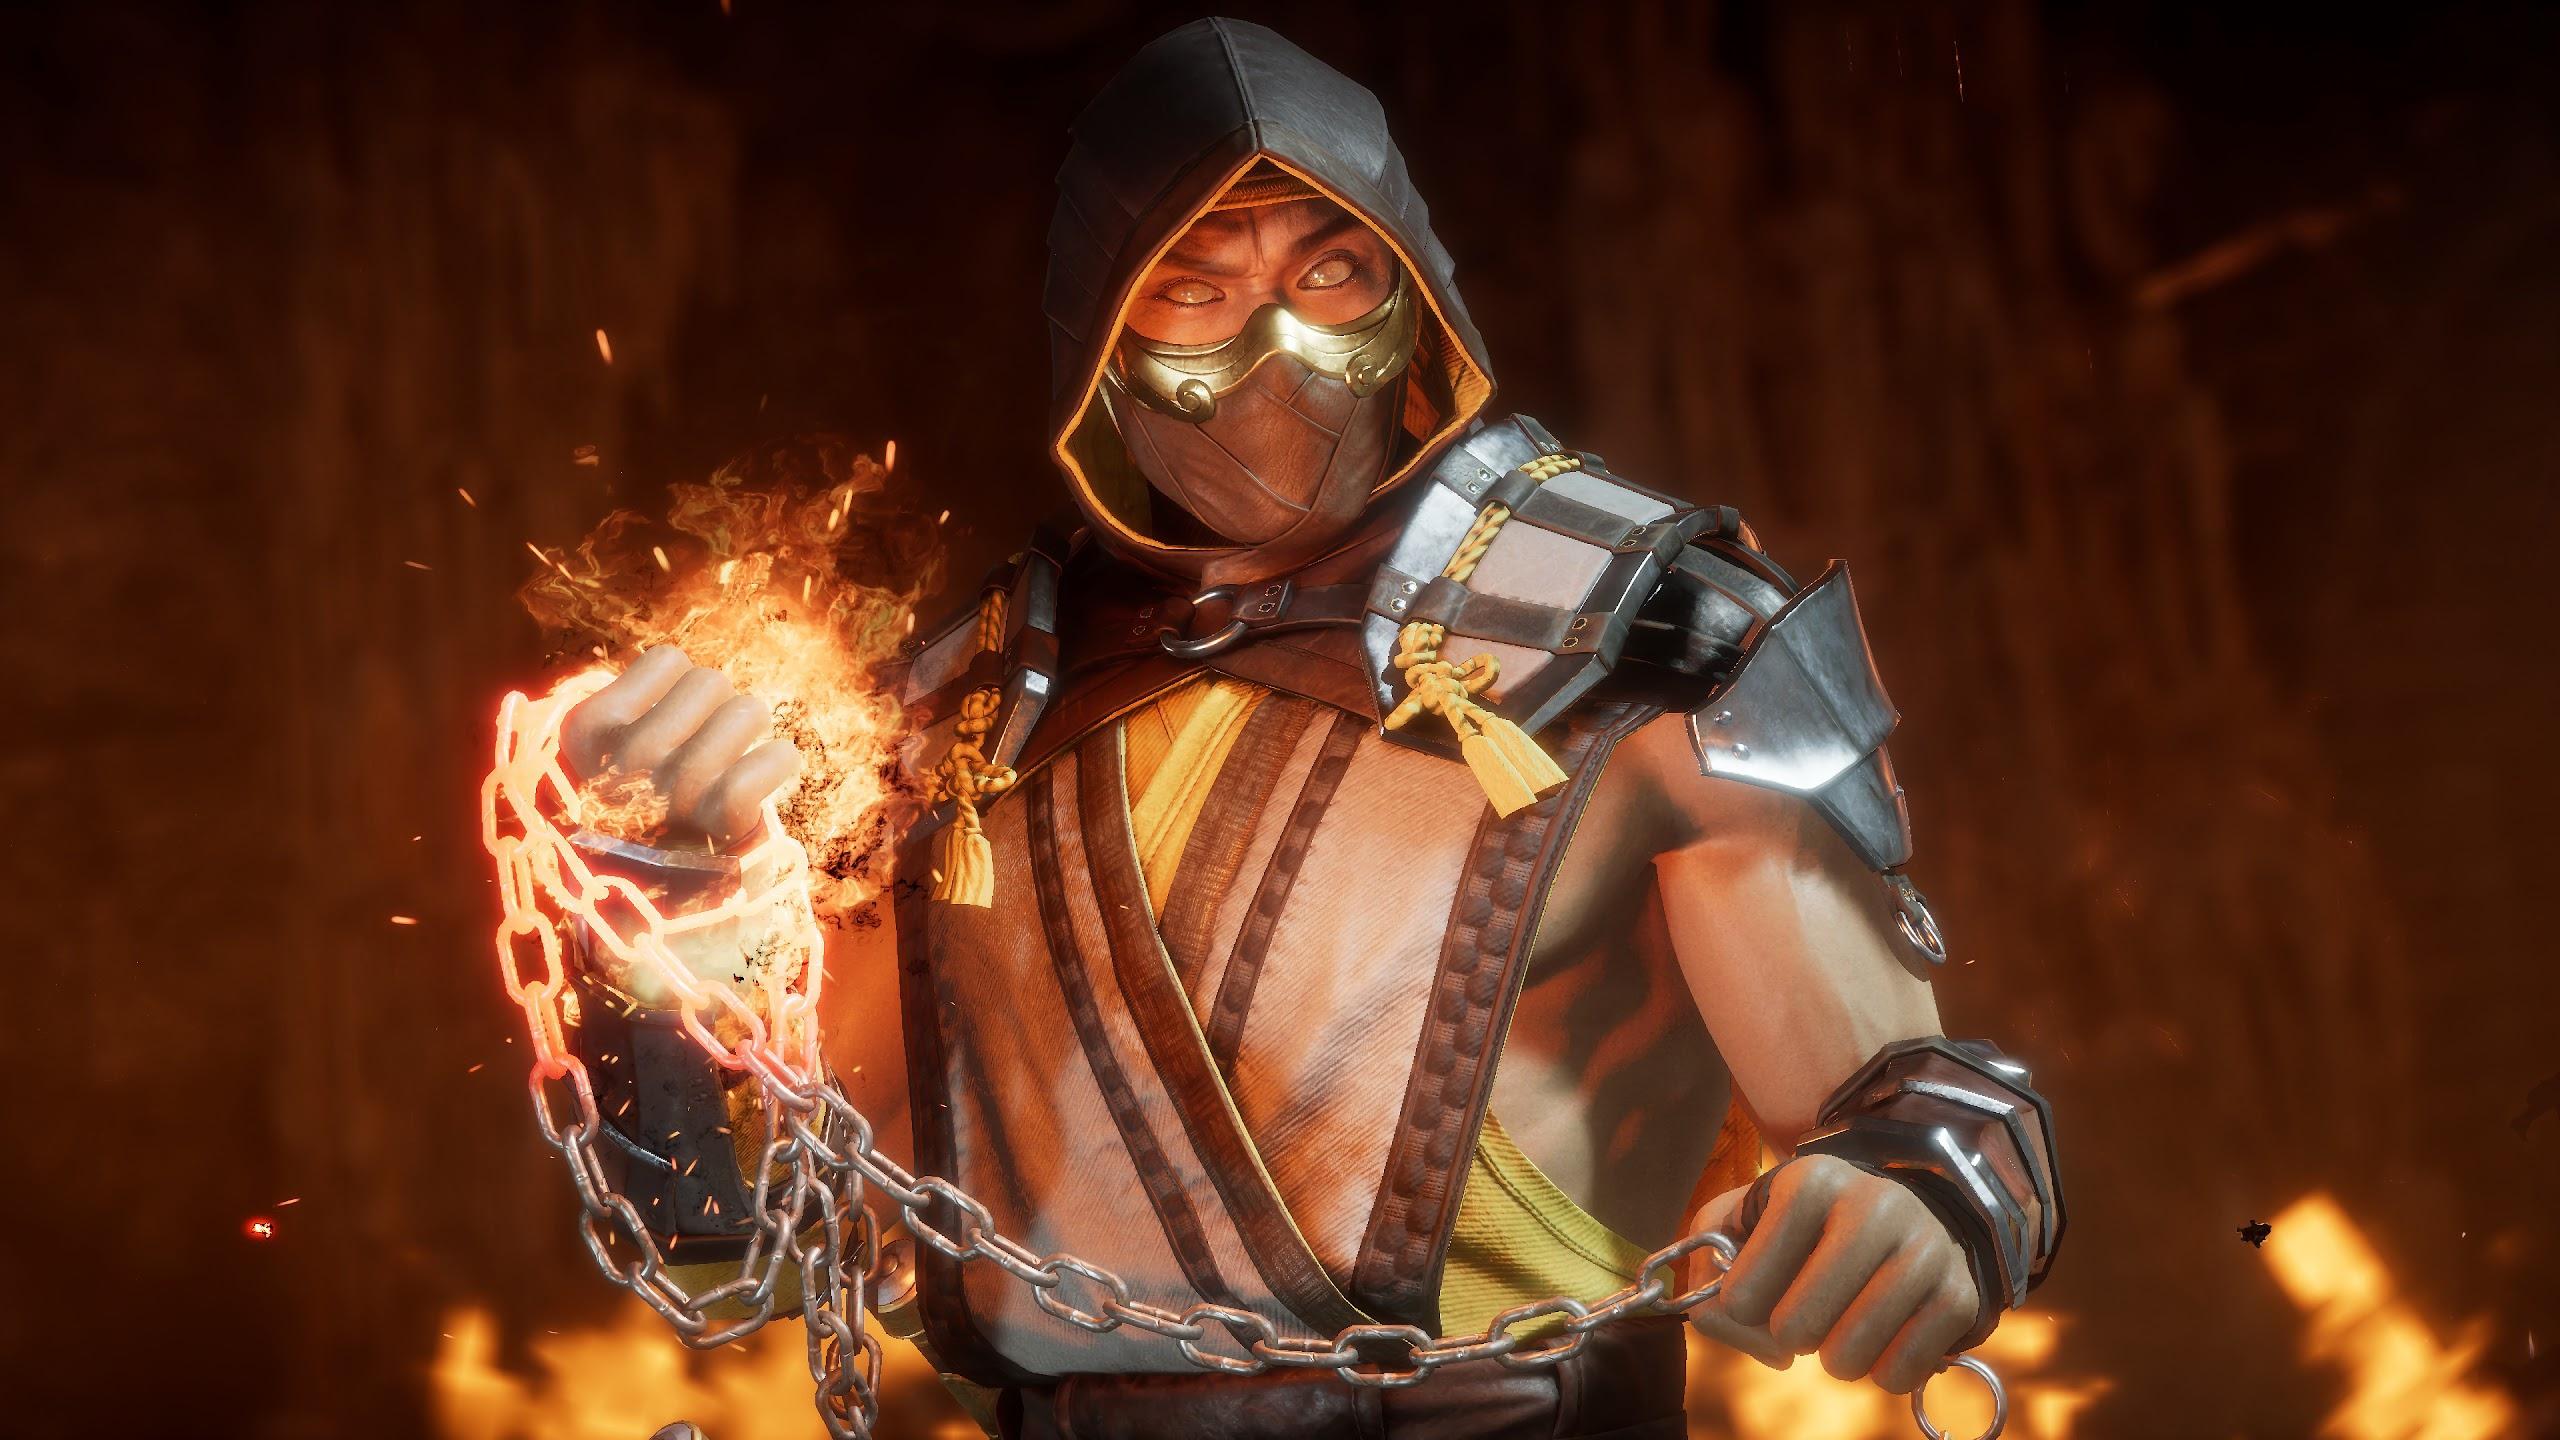 Scorpion, Mortal Kombat 11, 4K, #163 Wallpaper